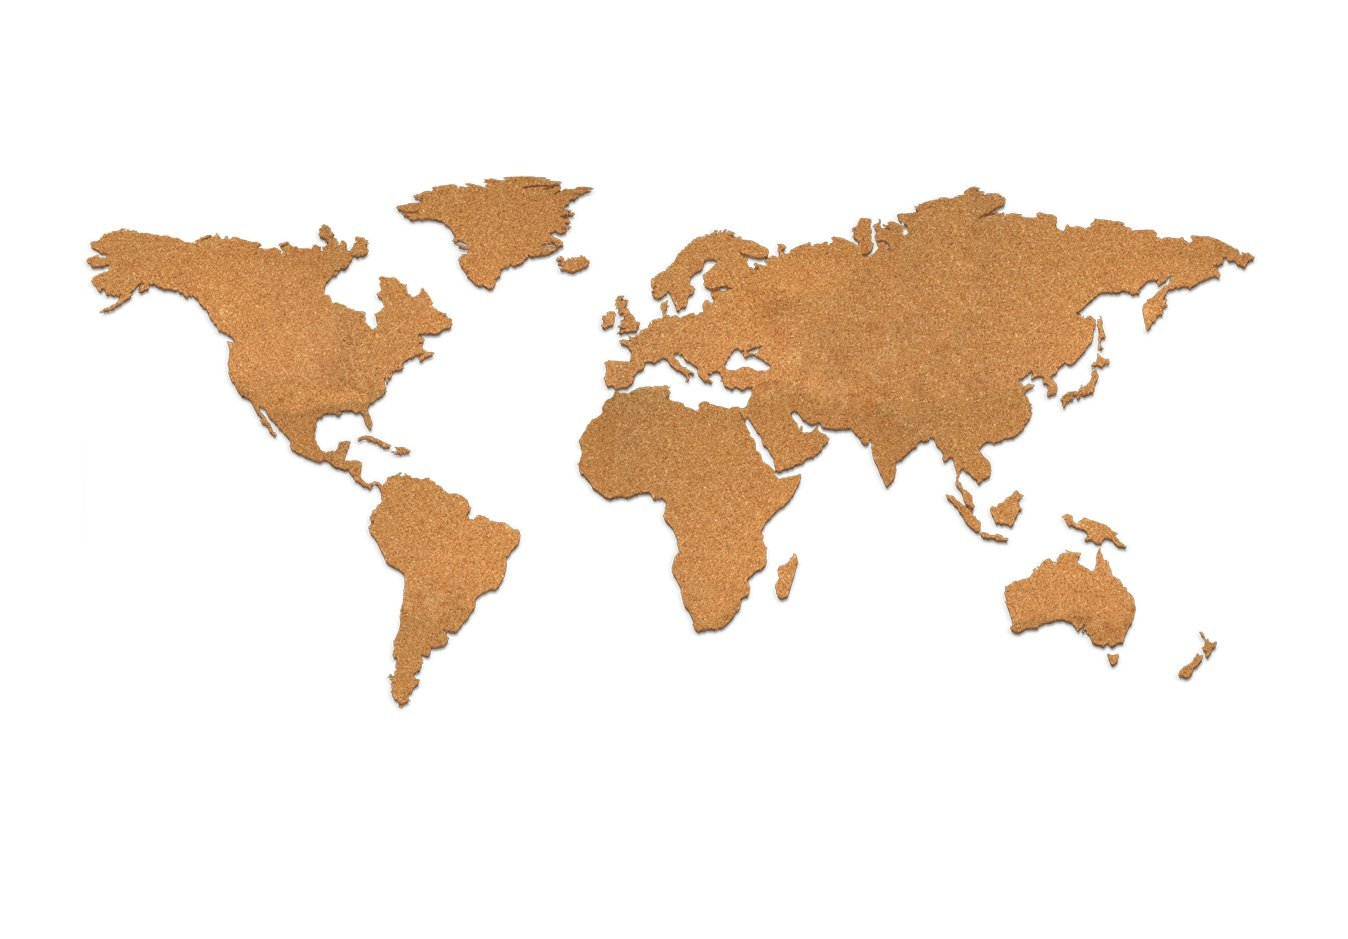 Korkpinnwand bei Globus Kork kaufen